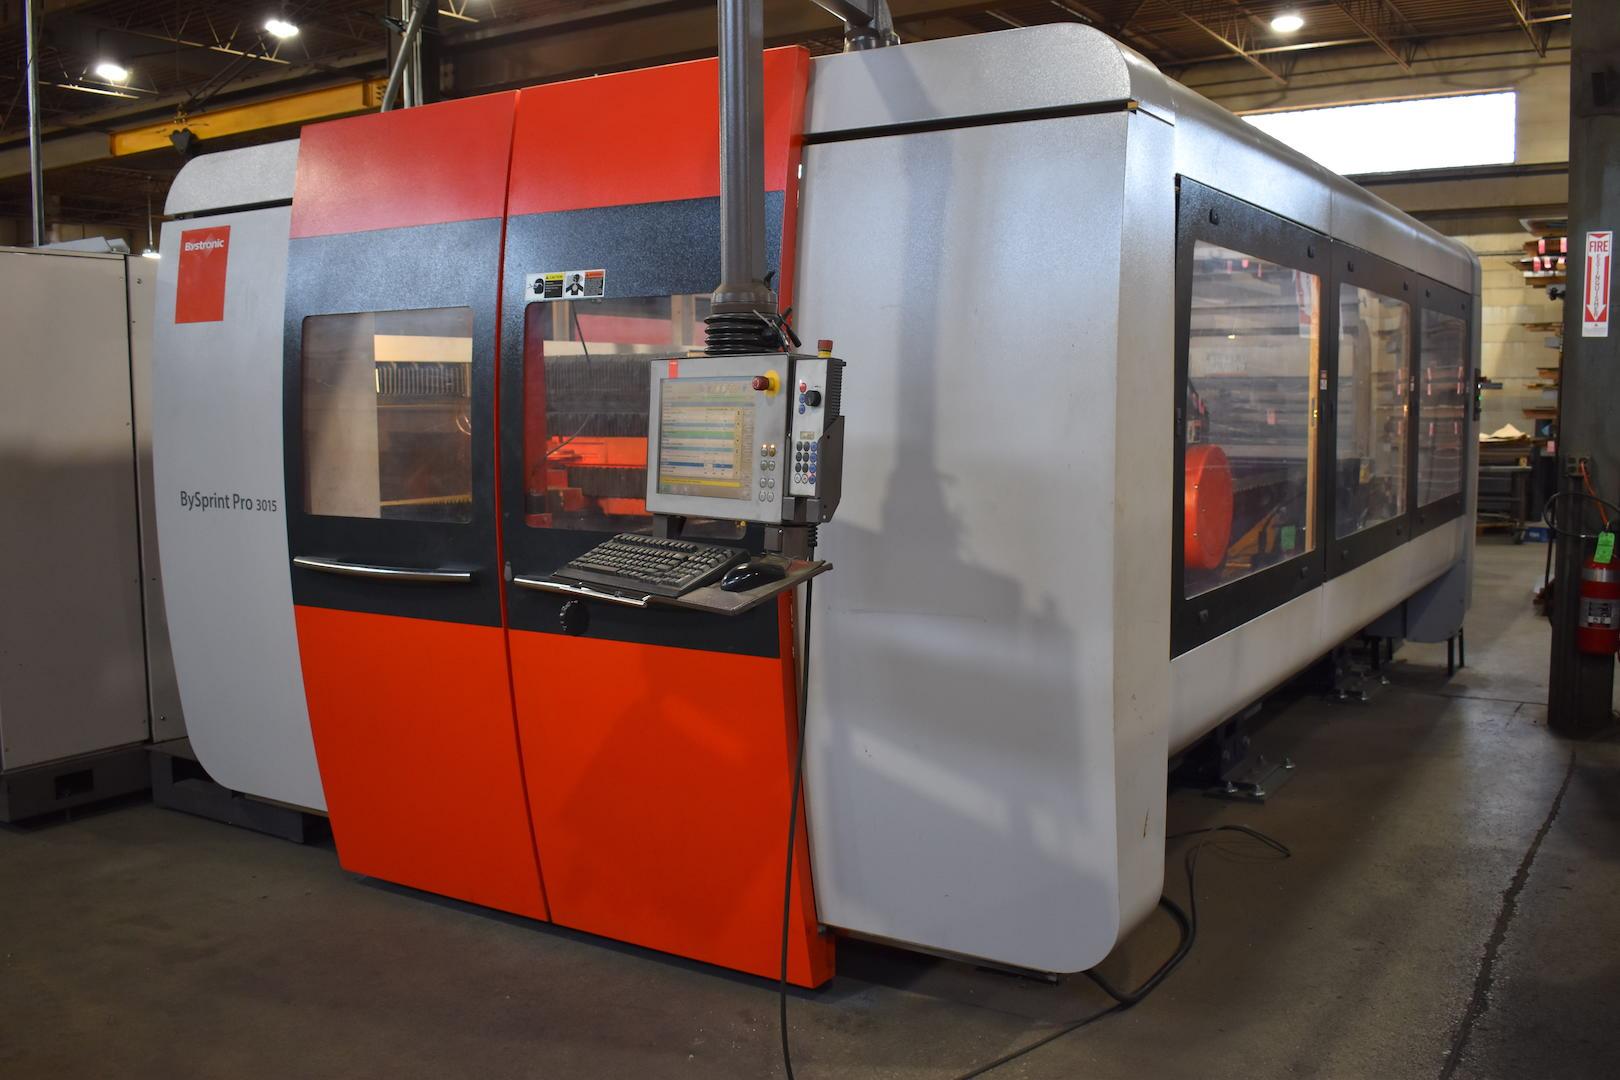 Lot 52 - Bystronic Model Bysprint Pro 3015 4400 Watt Twin-Table CNC Laser, S/N 30014476, Job No. 2413 (2011),